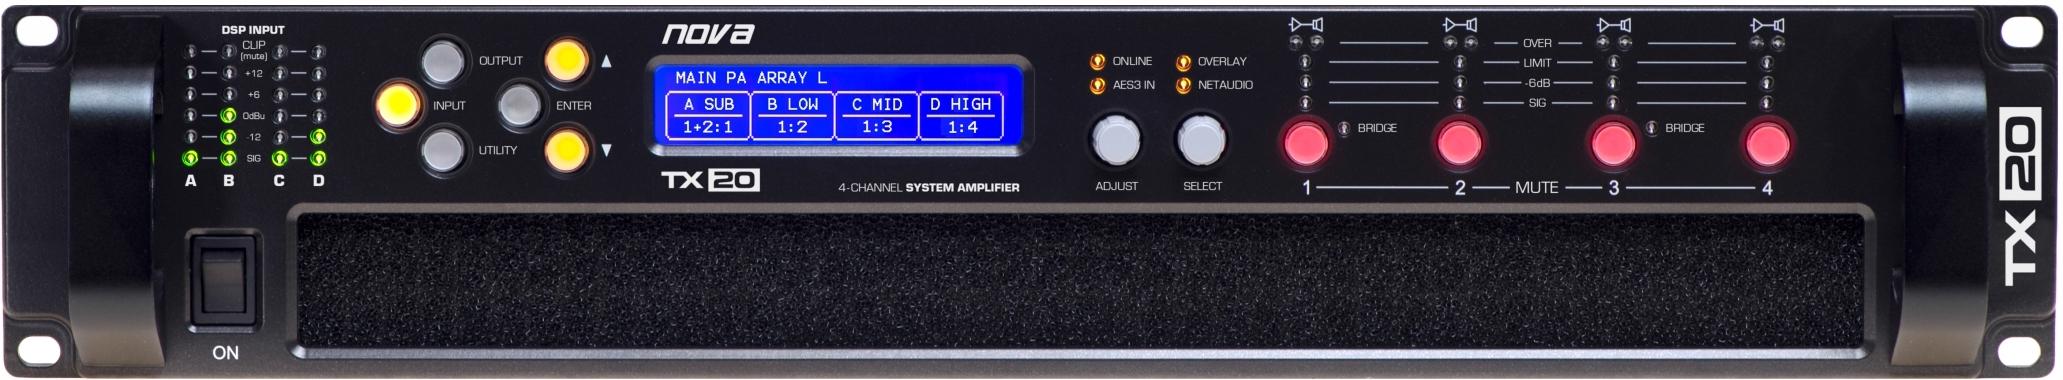 nova TX 20 DANTE+FIR, 4-kanálový zesilovač, 20kW, DSP, DANTE FIR